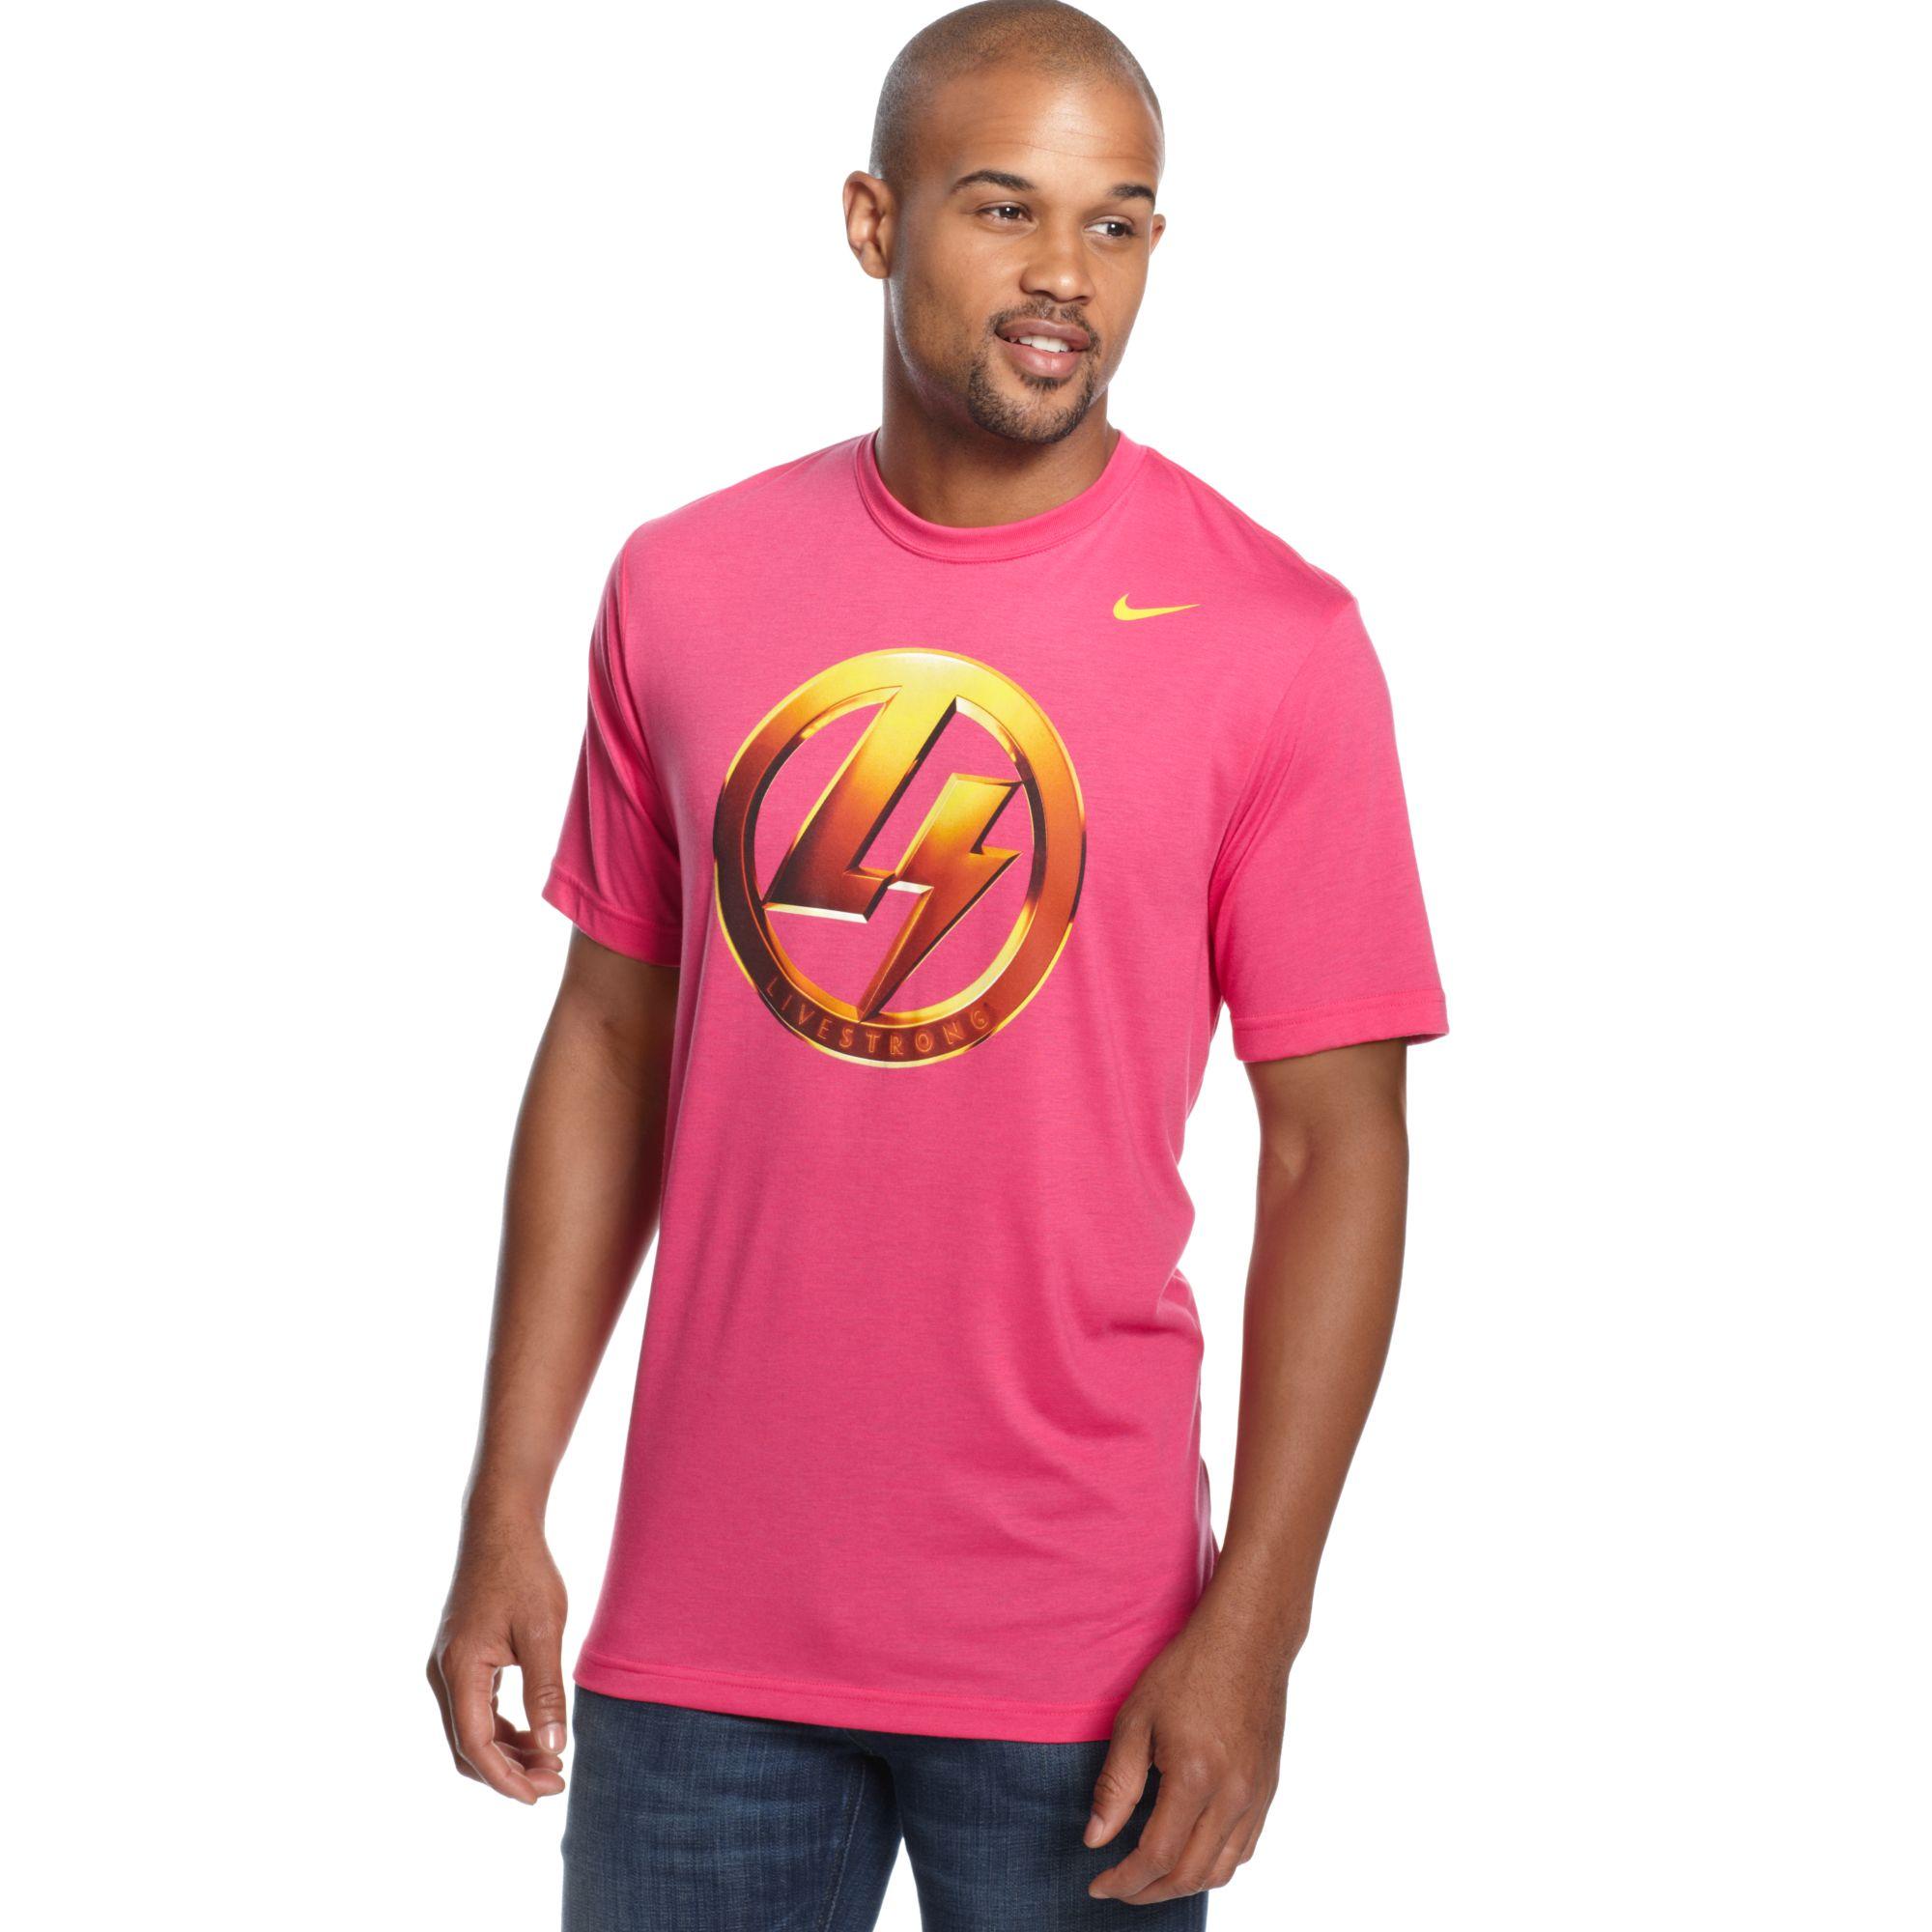 Mens Pink Nike Dri Fit Shirt